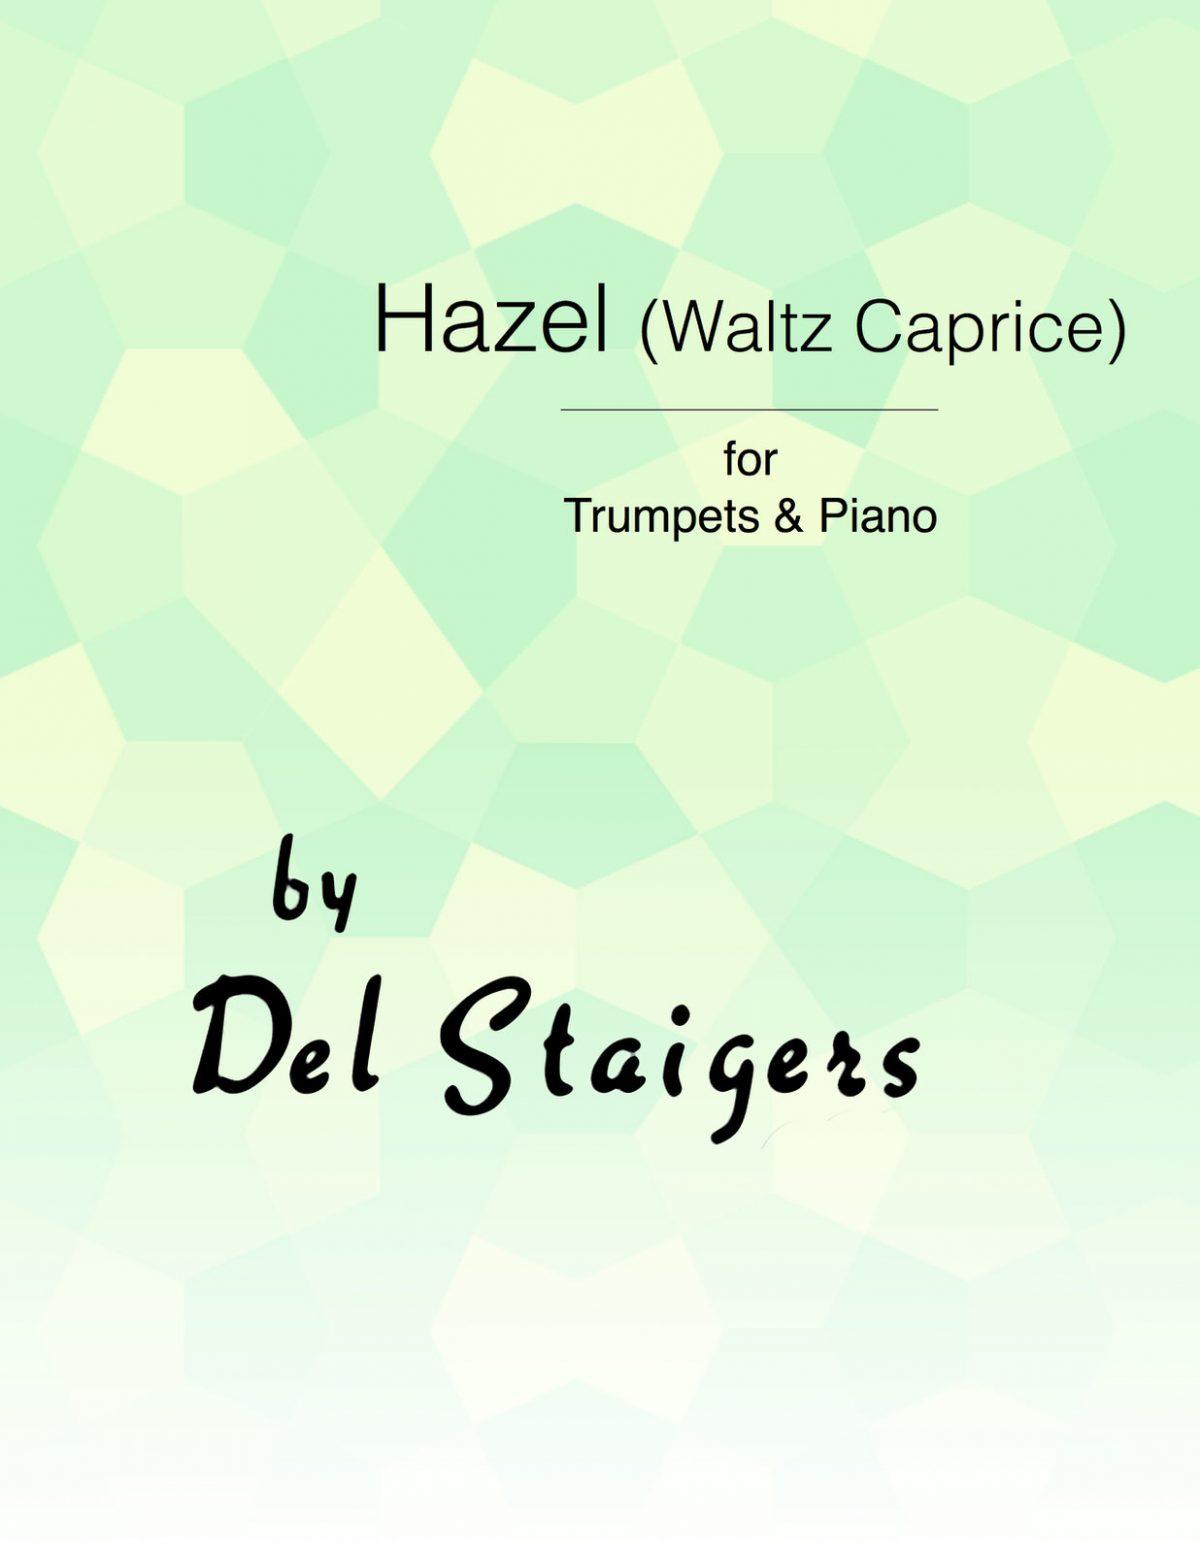 Staigers, Hazel (Waltz Caprice) Letter